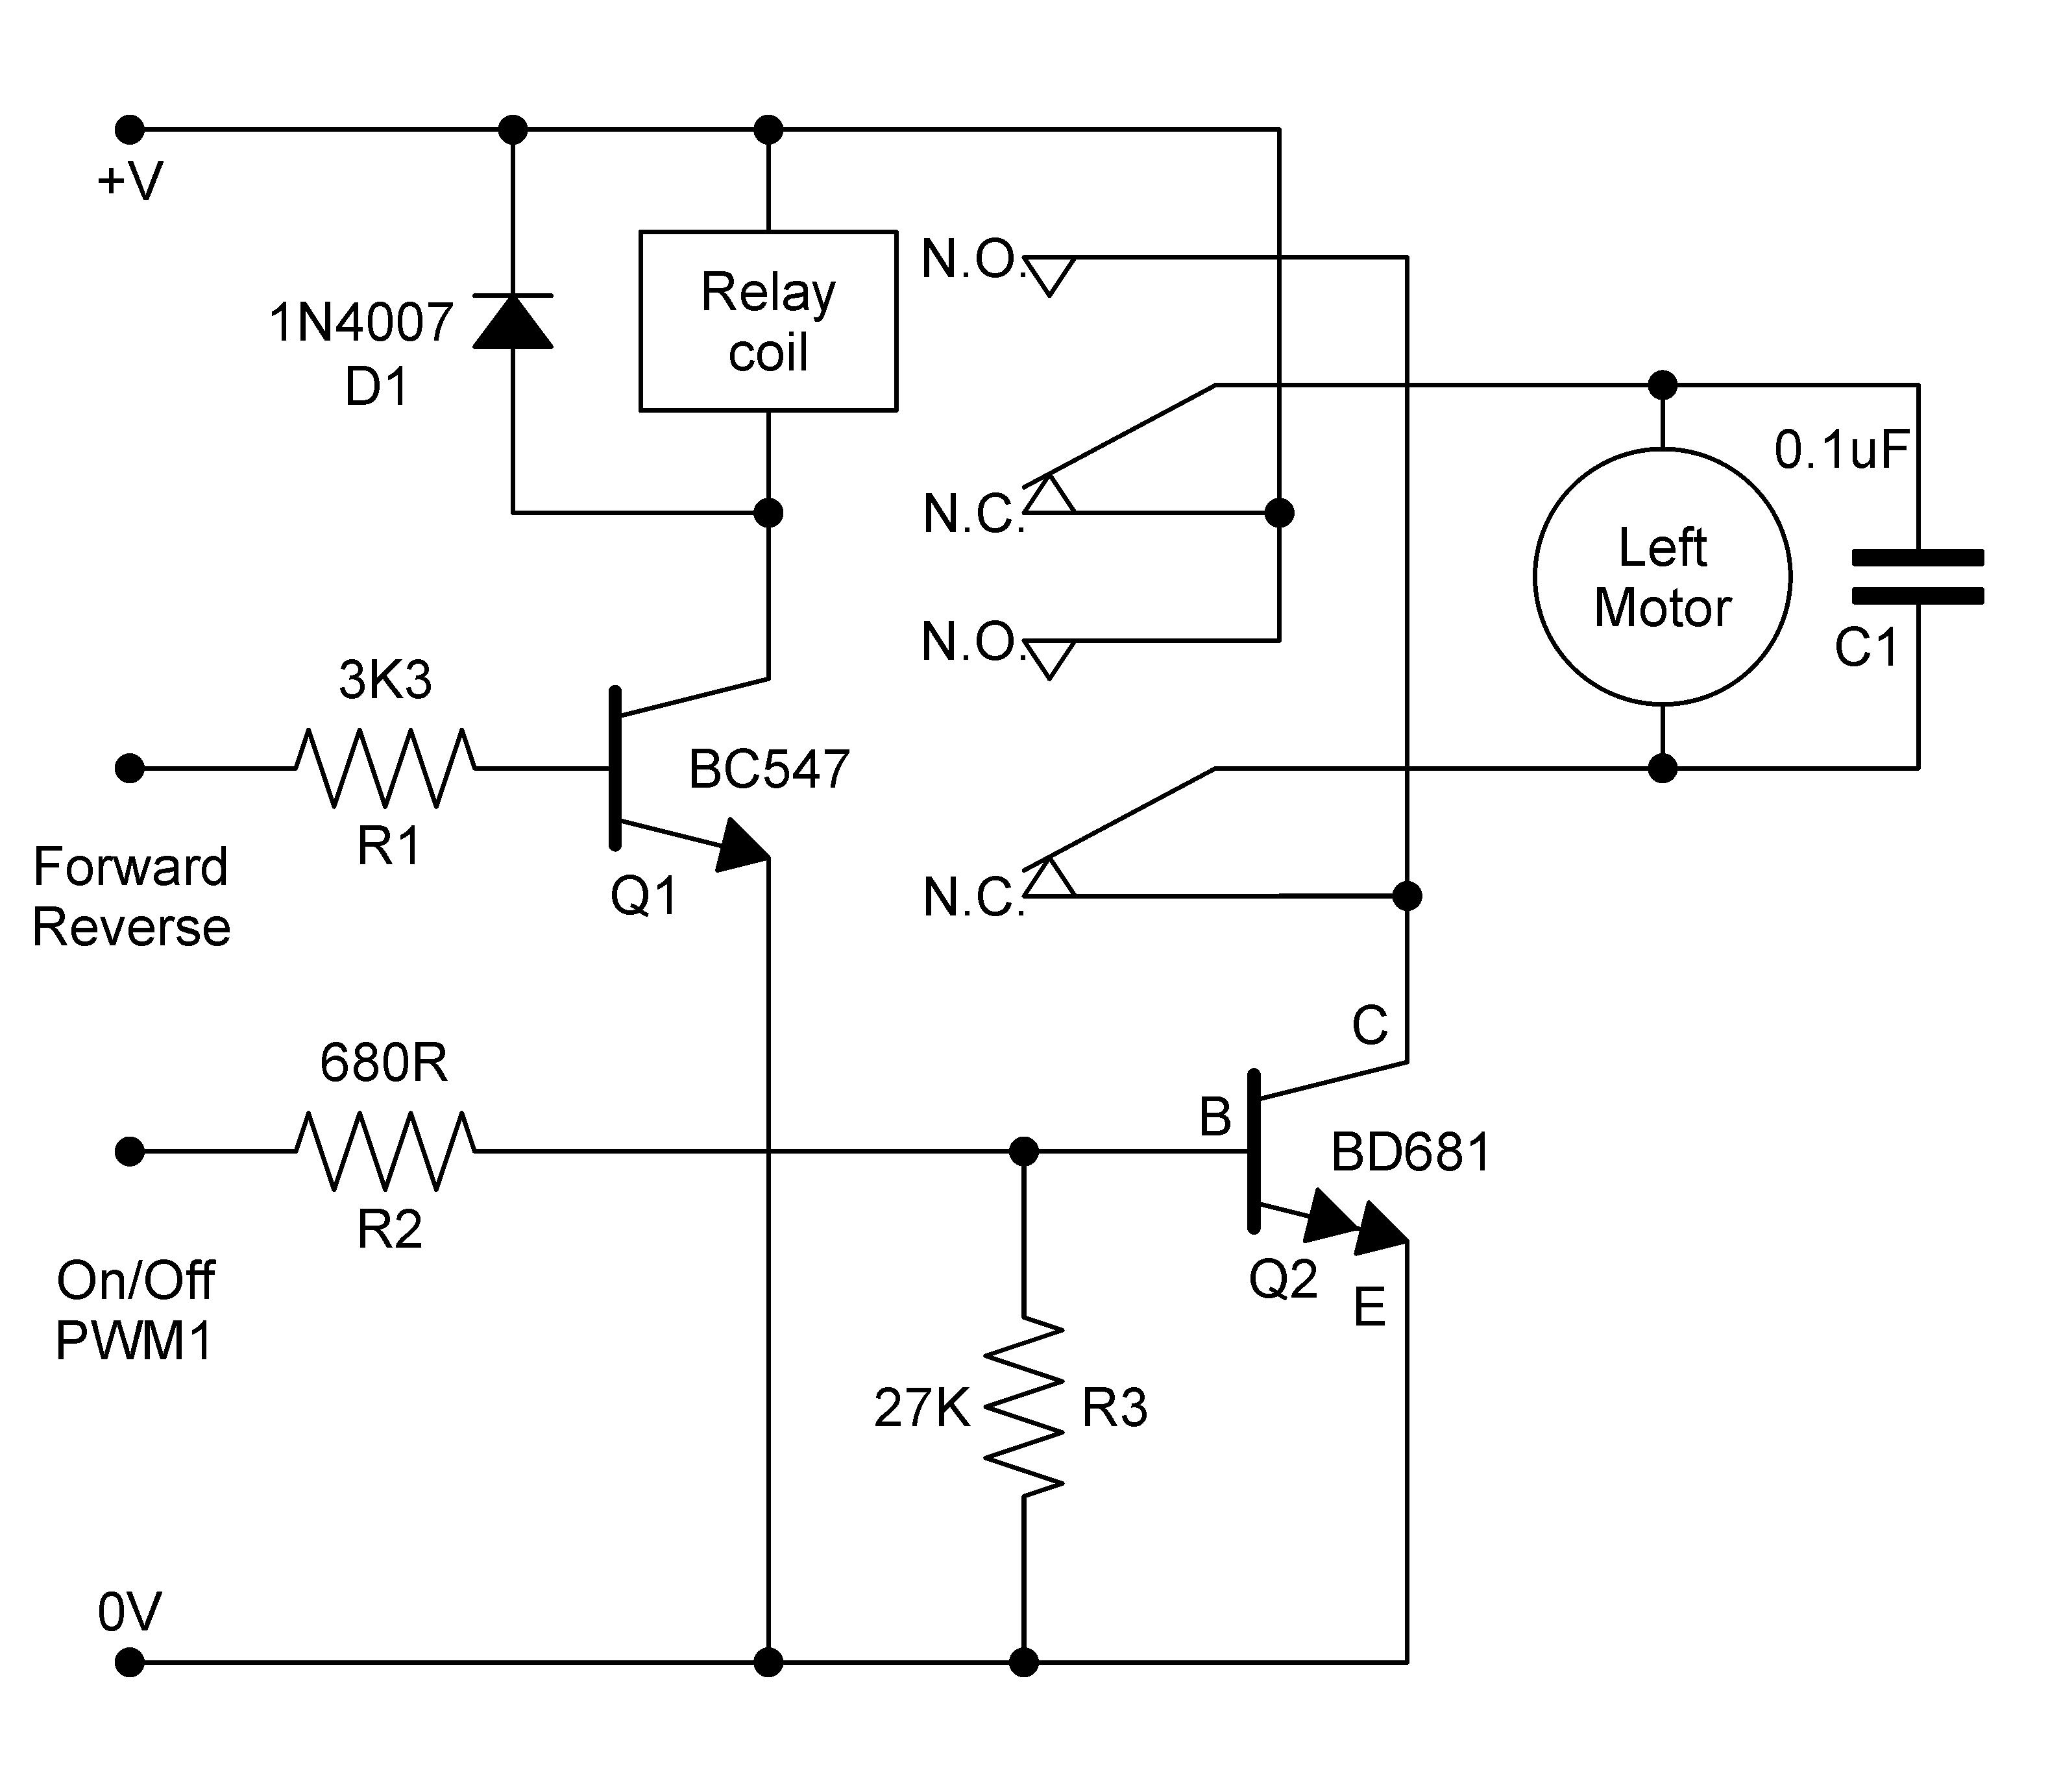 hight resolution of bridge relay circuit diagram